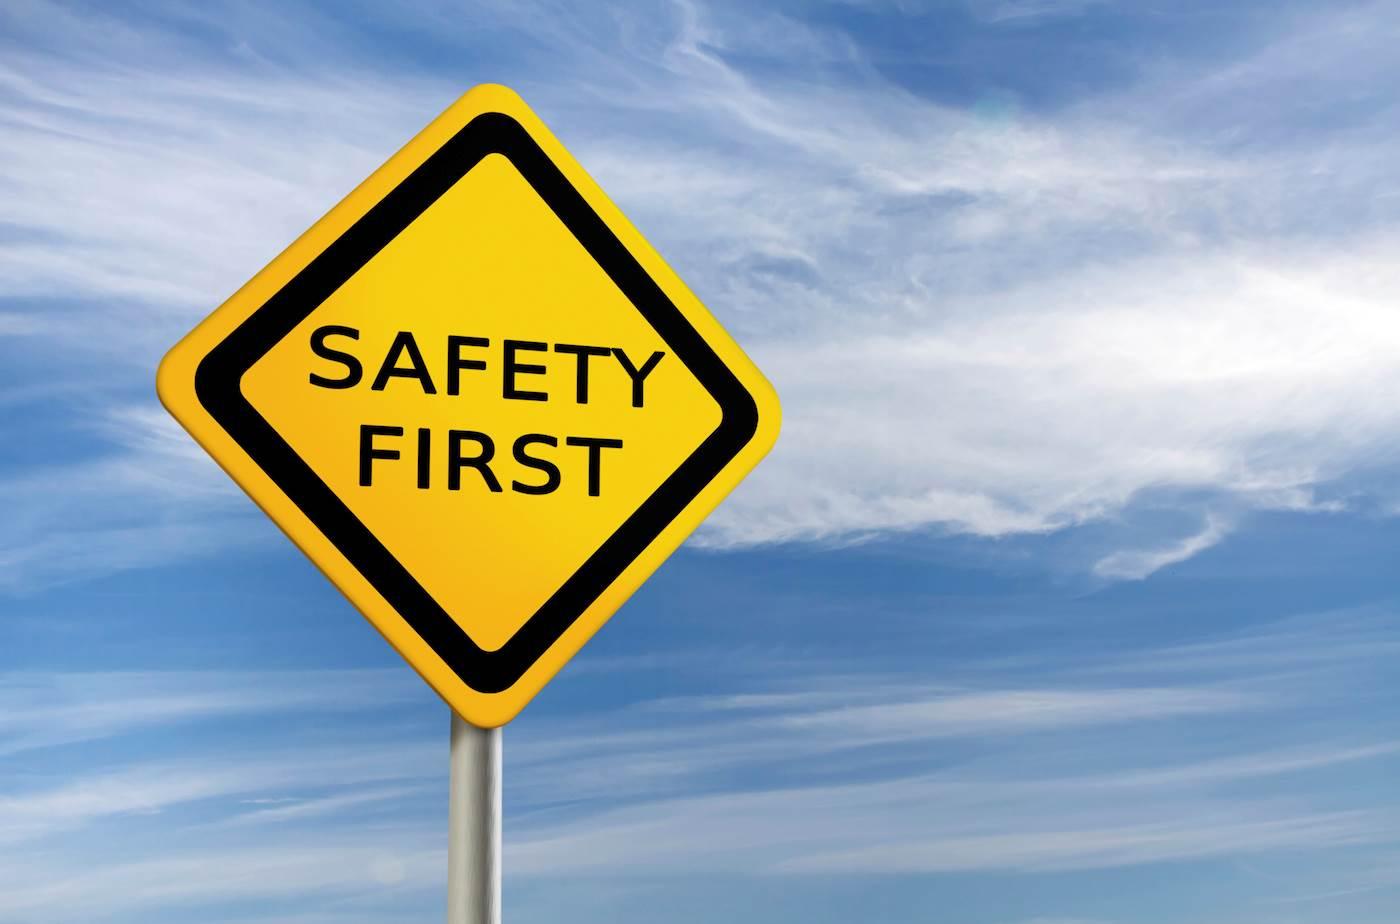 6361703775116023131527048689_safety-first